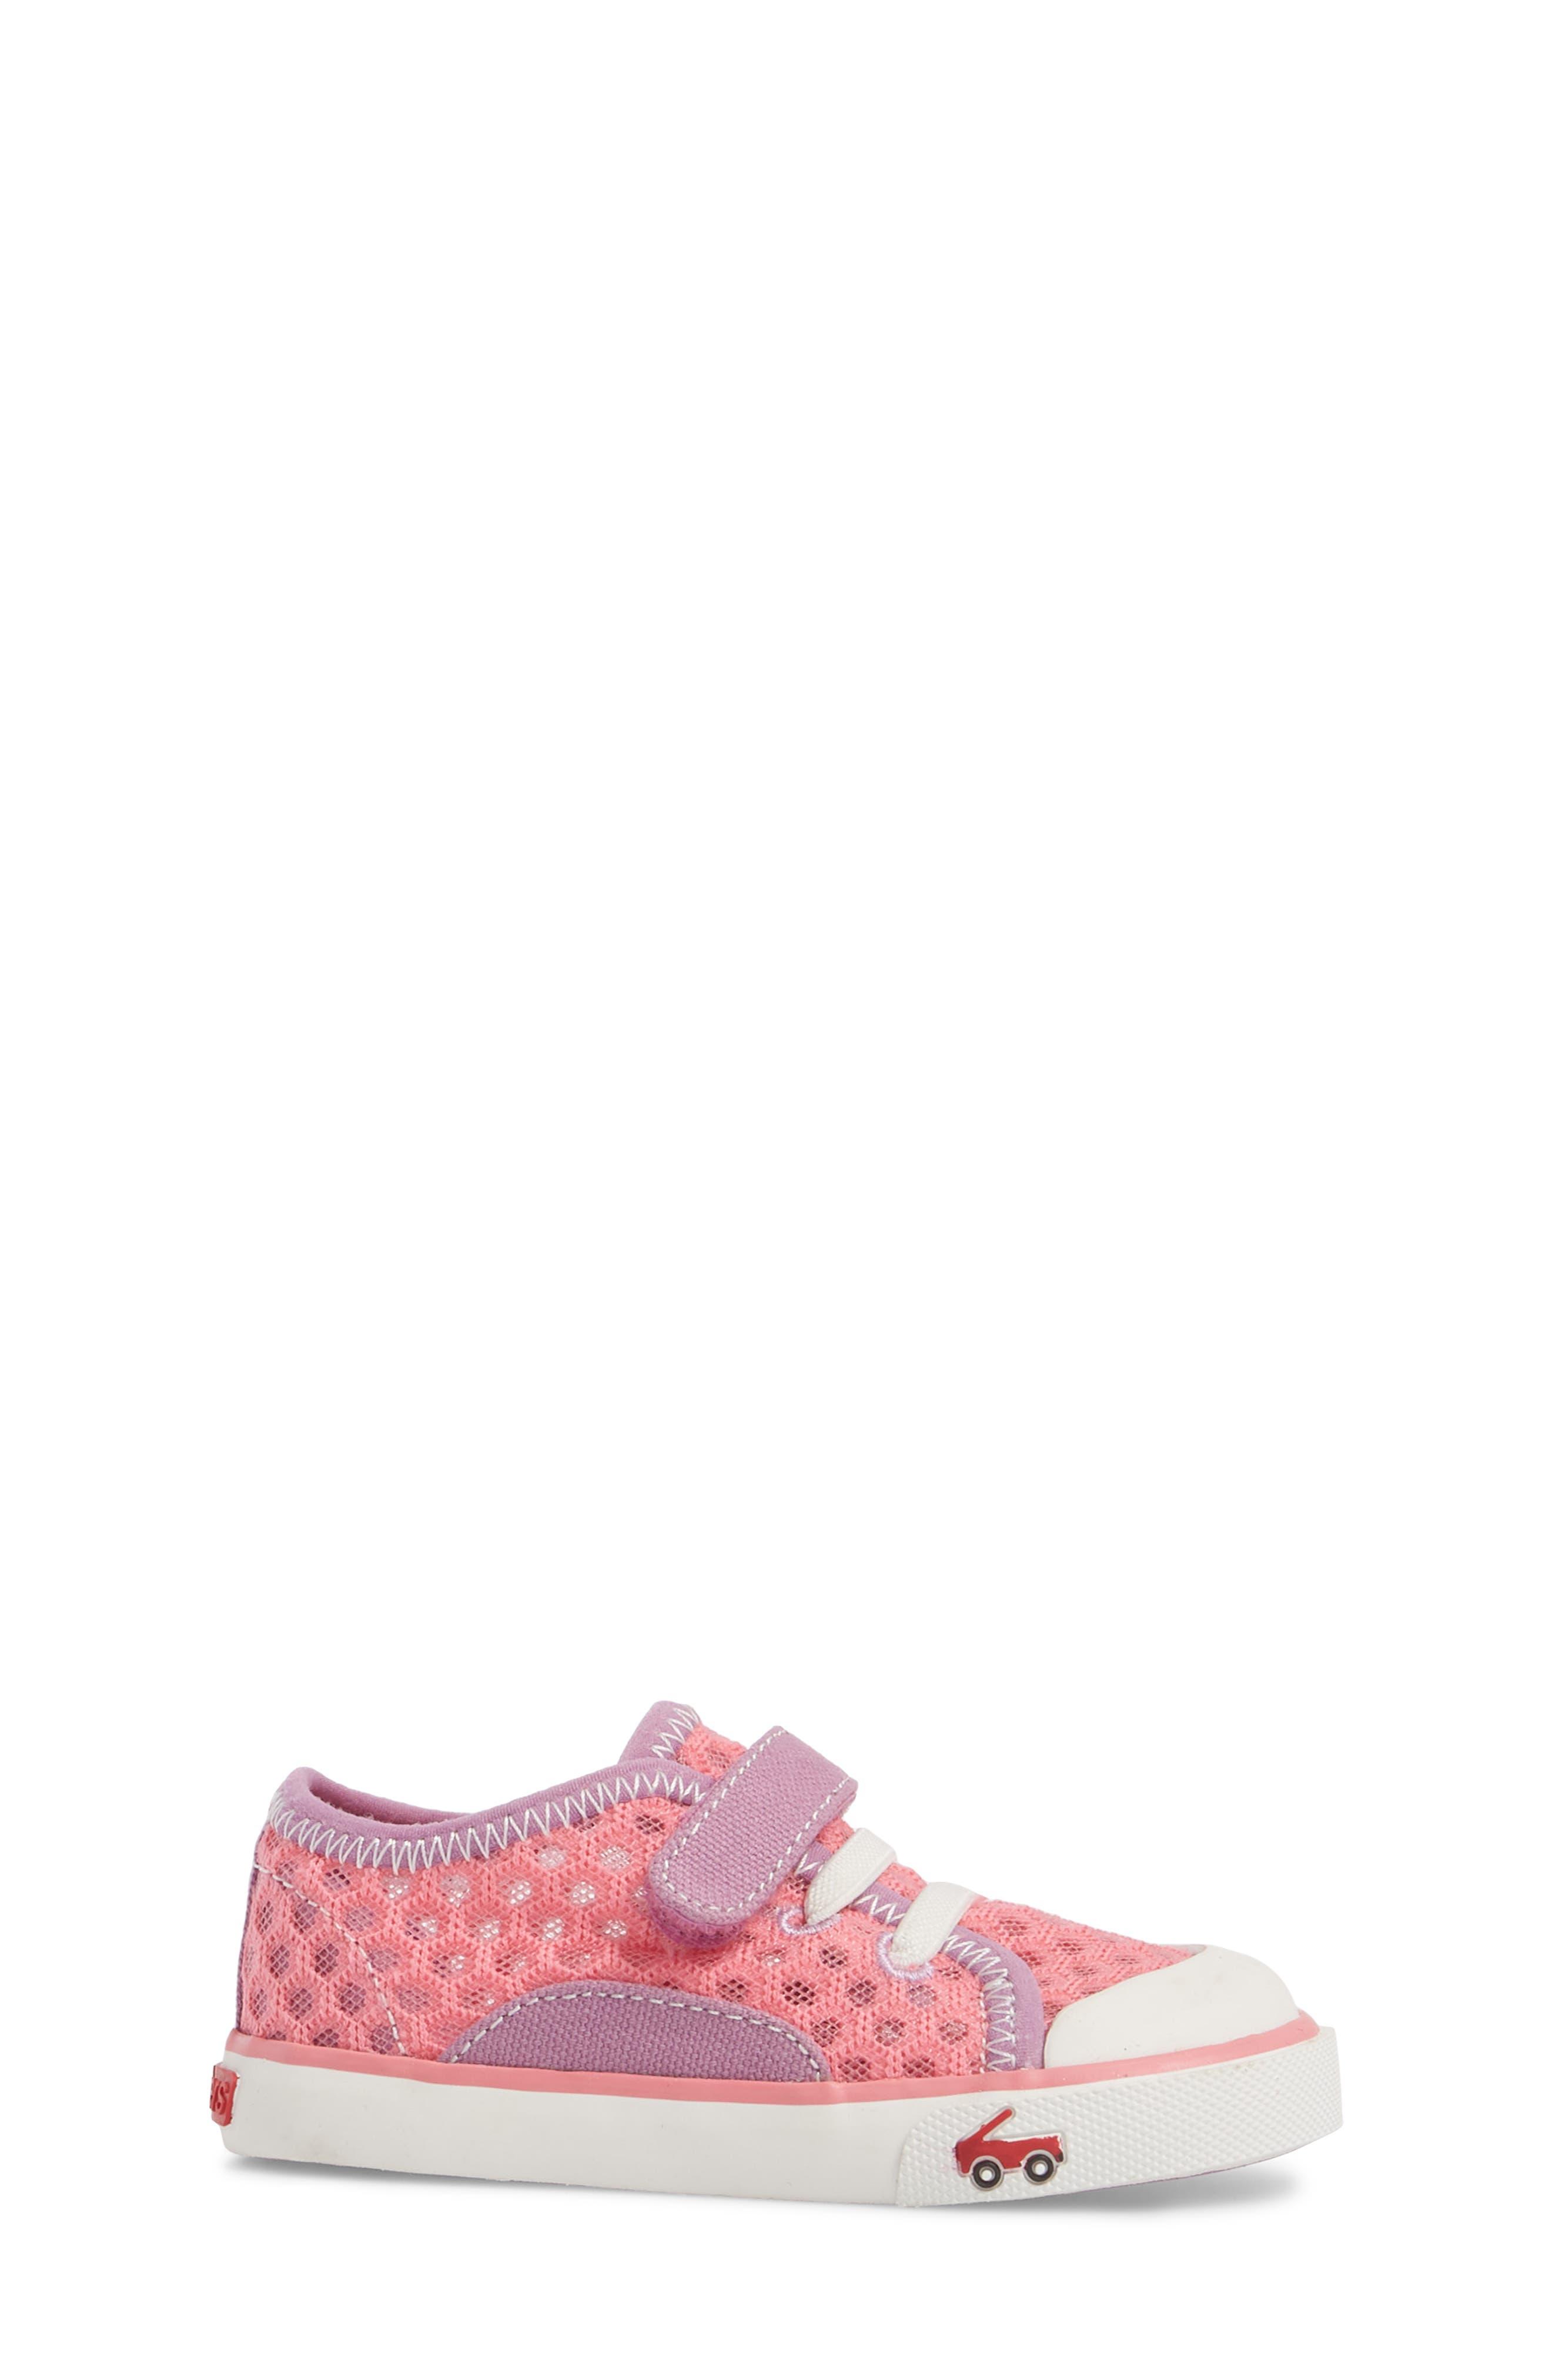 Saylor Sneaker,                             Alternate thumbnail 3, color,                             670